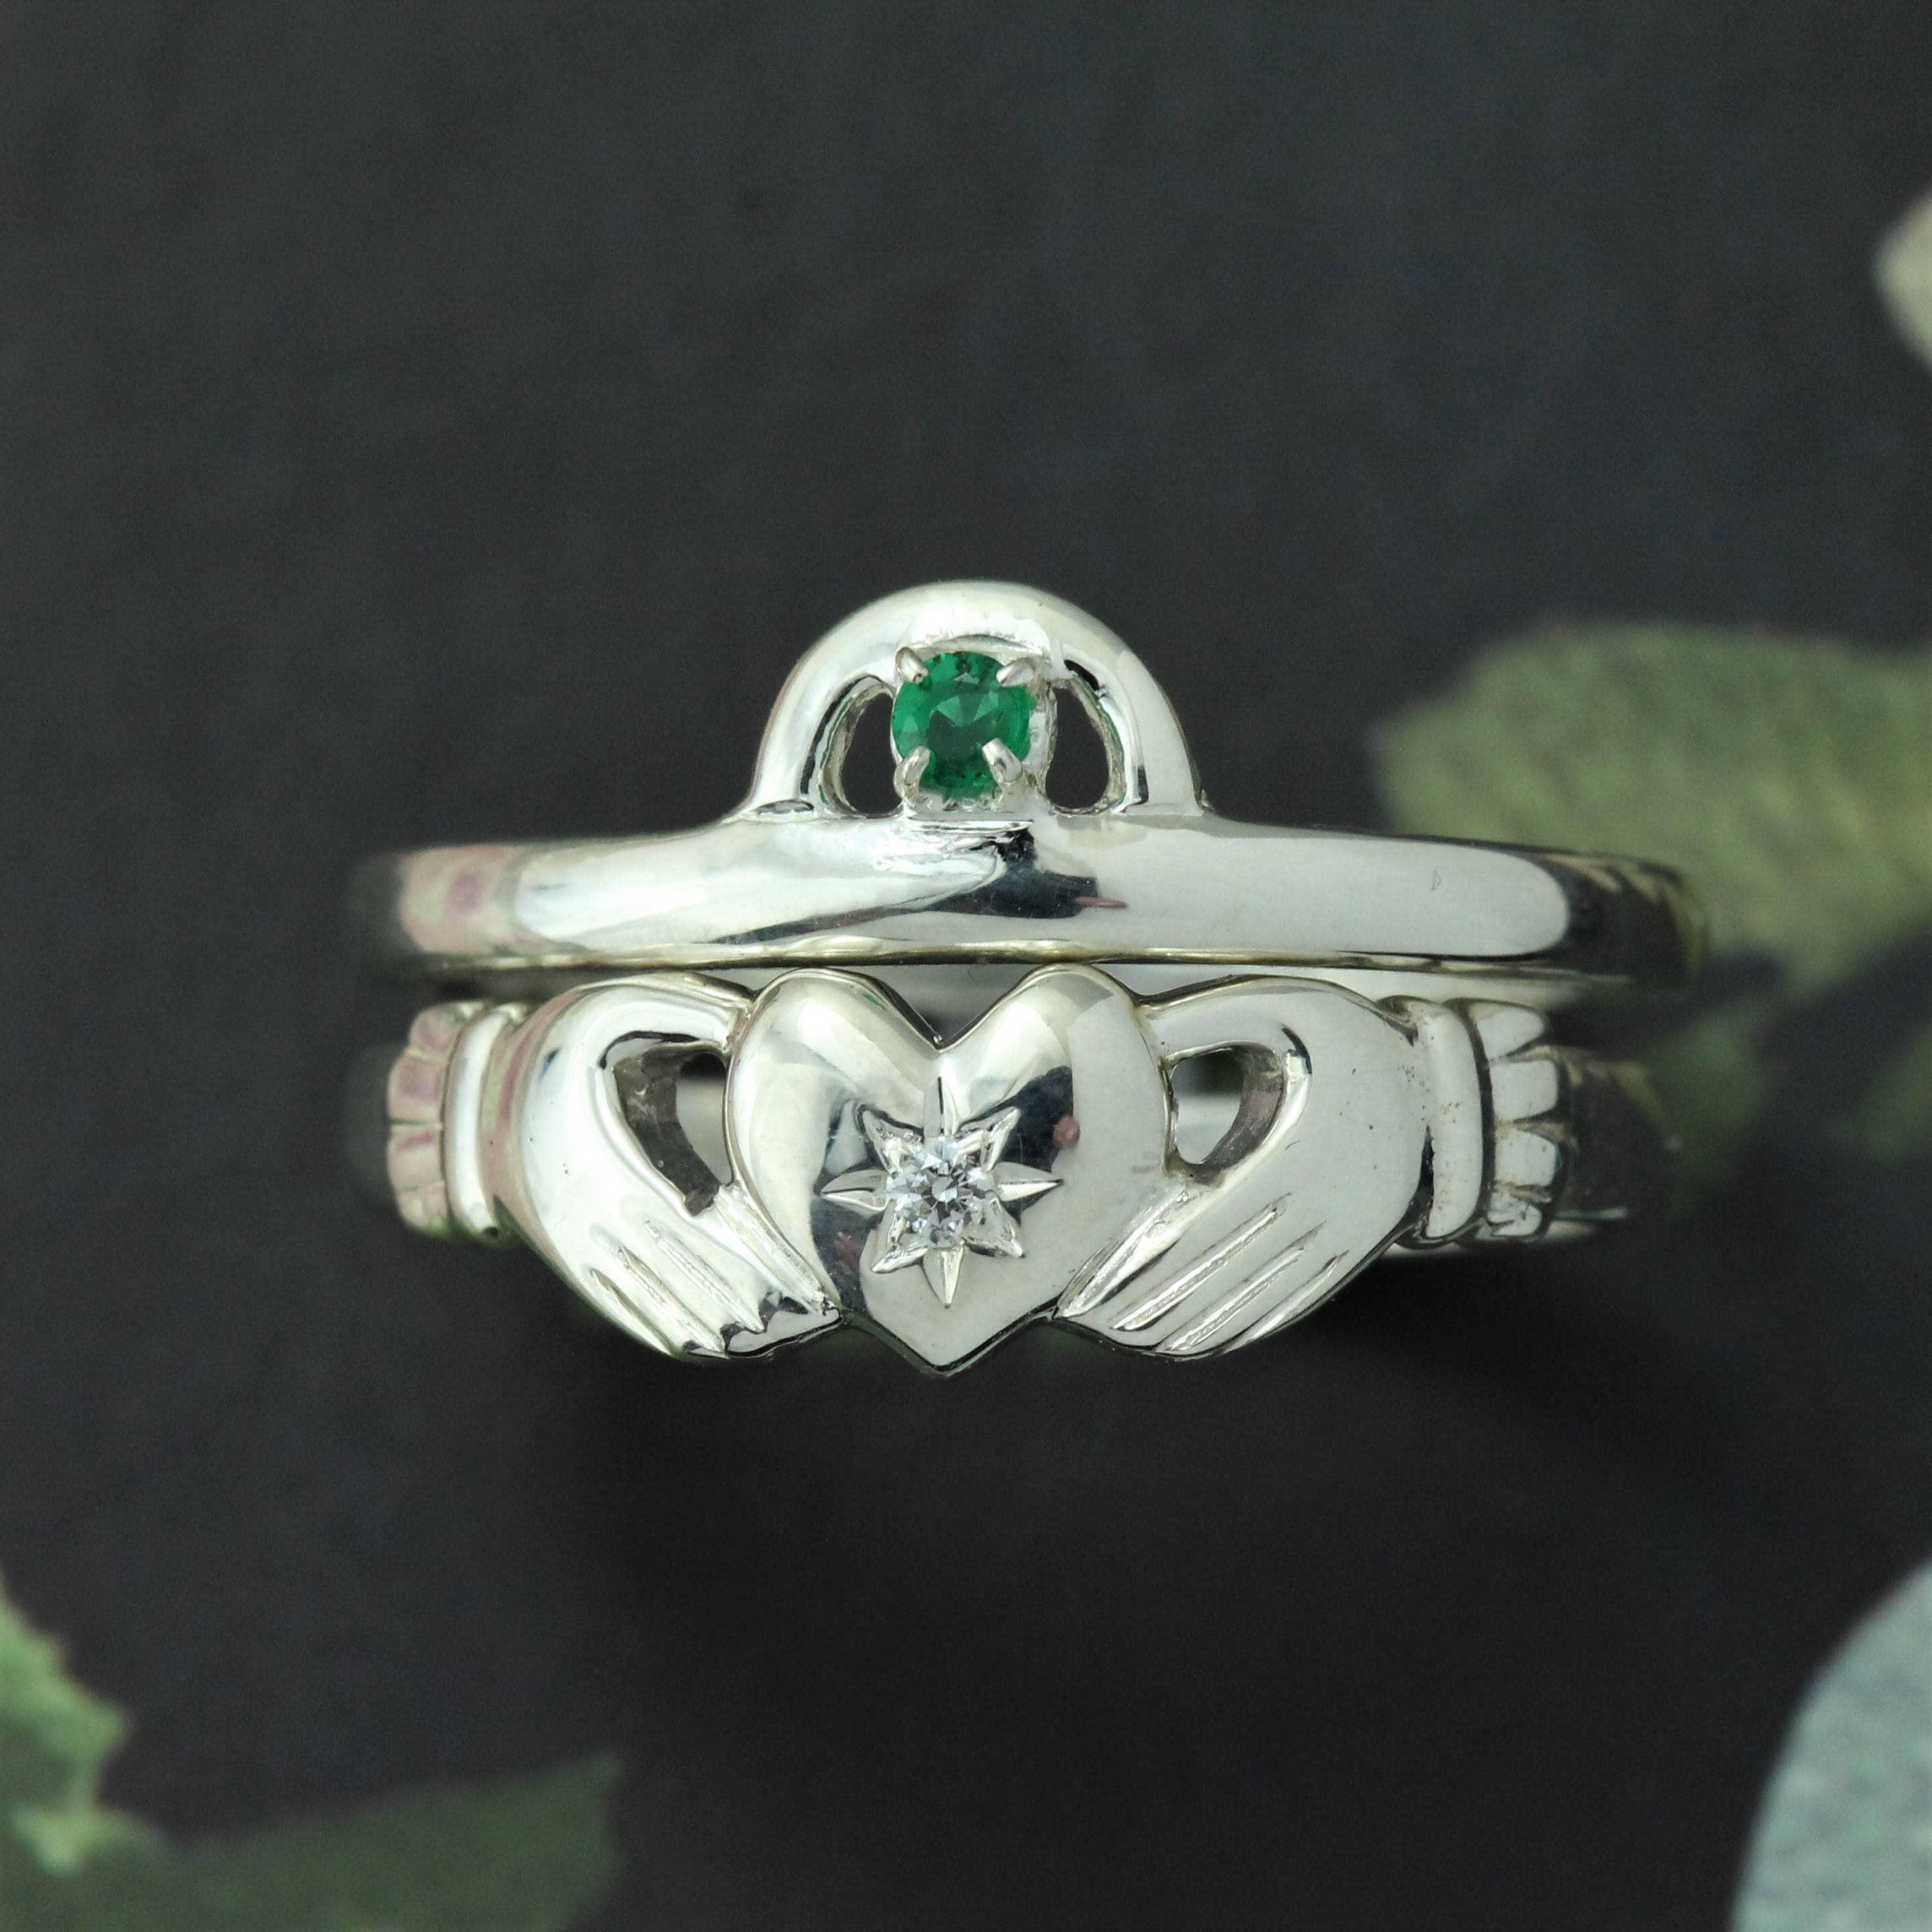 diamond and emerald claddagh ring irish claddagh emerald. Black Bedroom Furniture Sets. Home Design Ideas